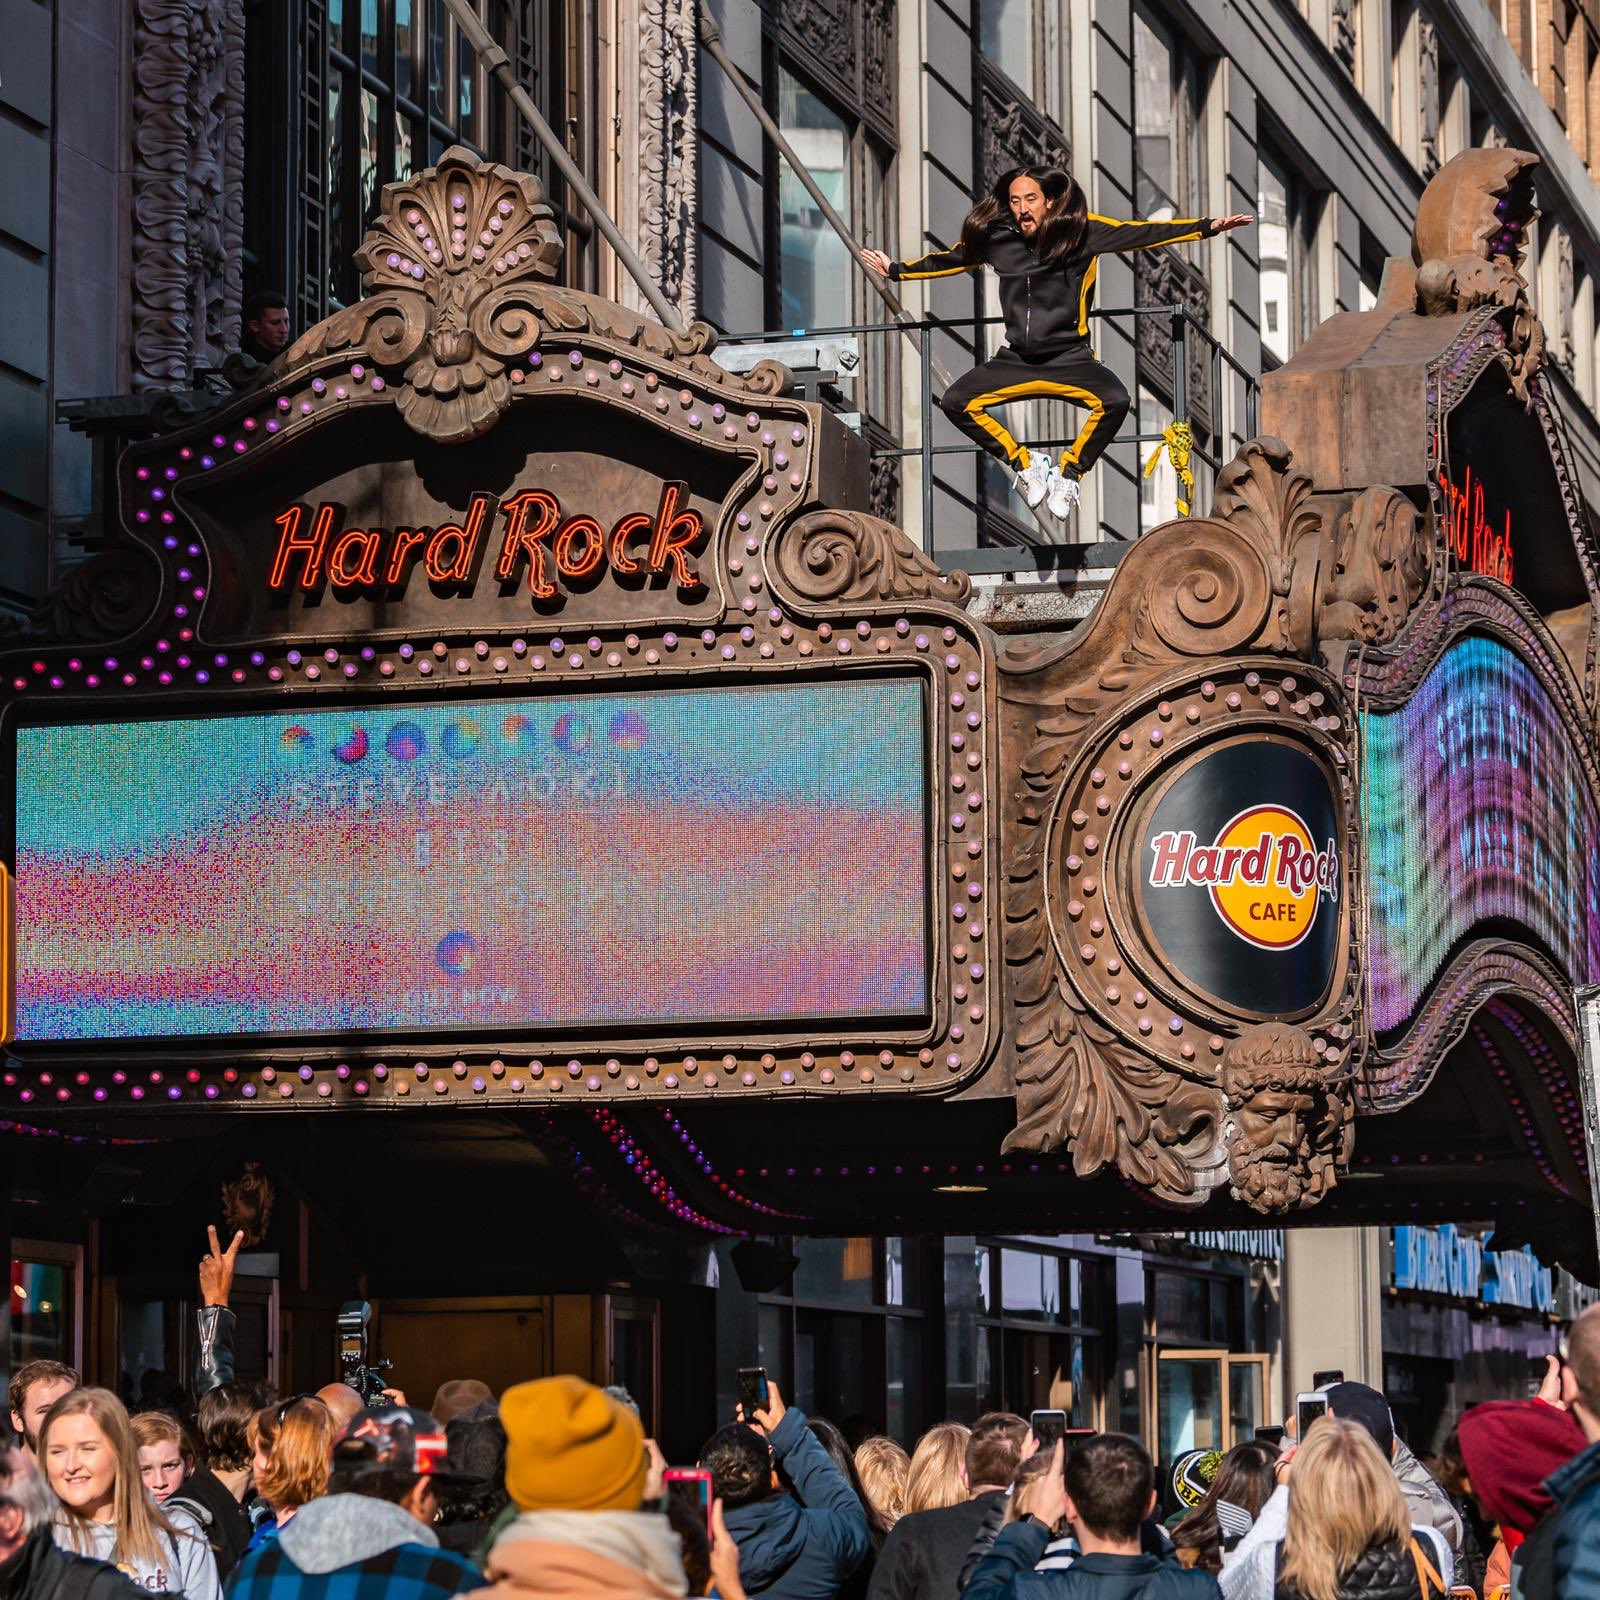 #aokijump #951. The #NeonFuture3 Eve Time Square Jump. Hard Rock NYC. November 8, 2018. #wasteitonme #btsarmyb https://t.co/RIgqeS9Blu